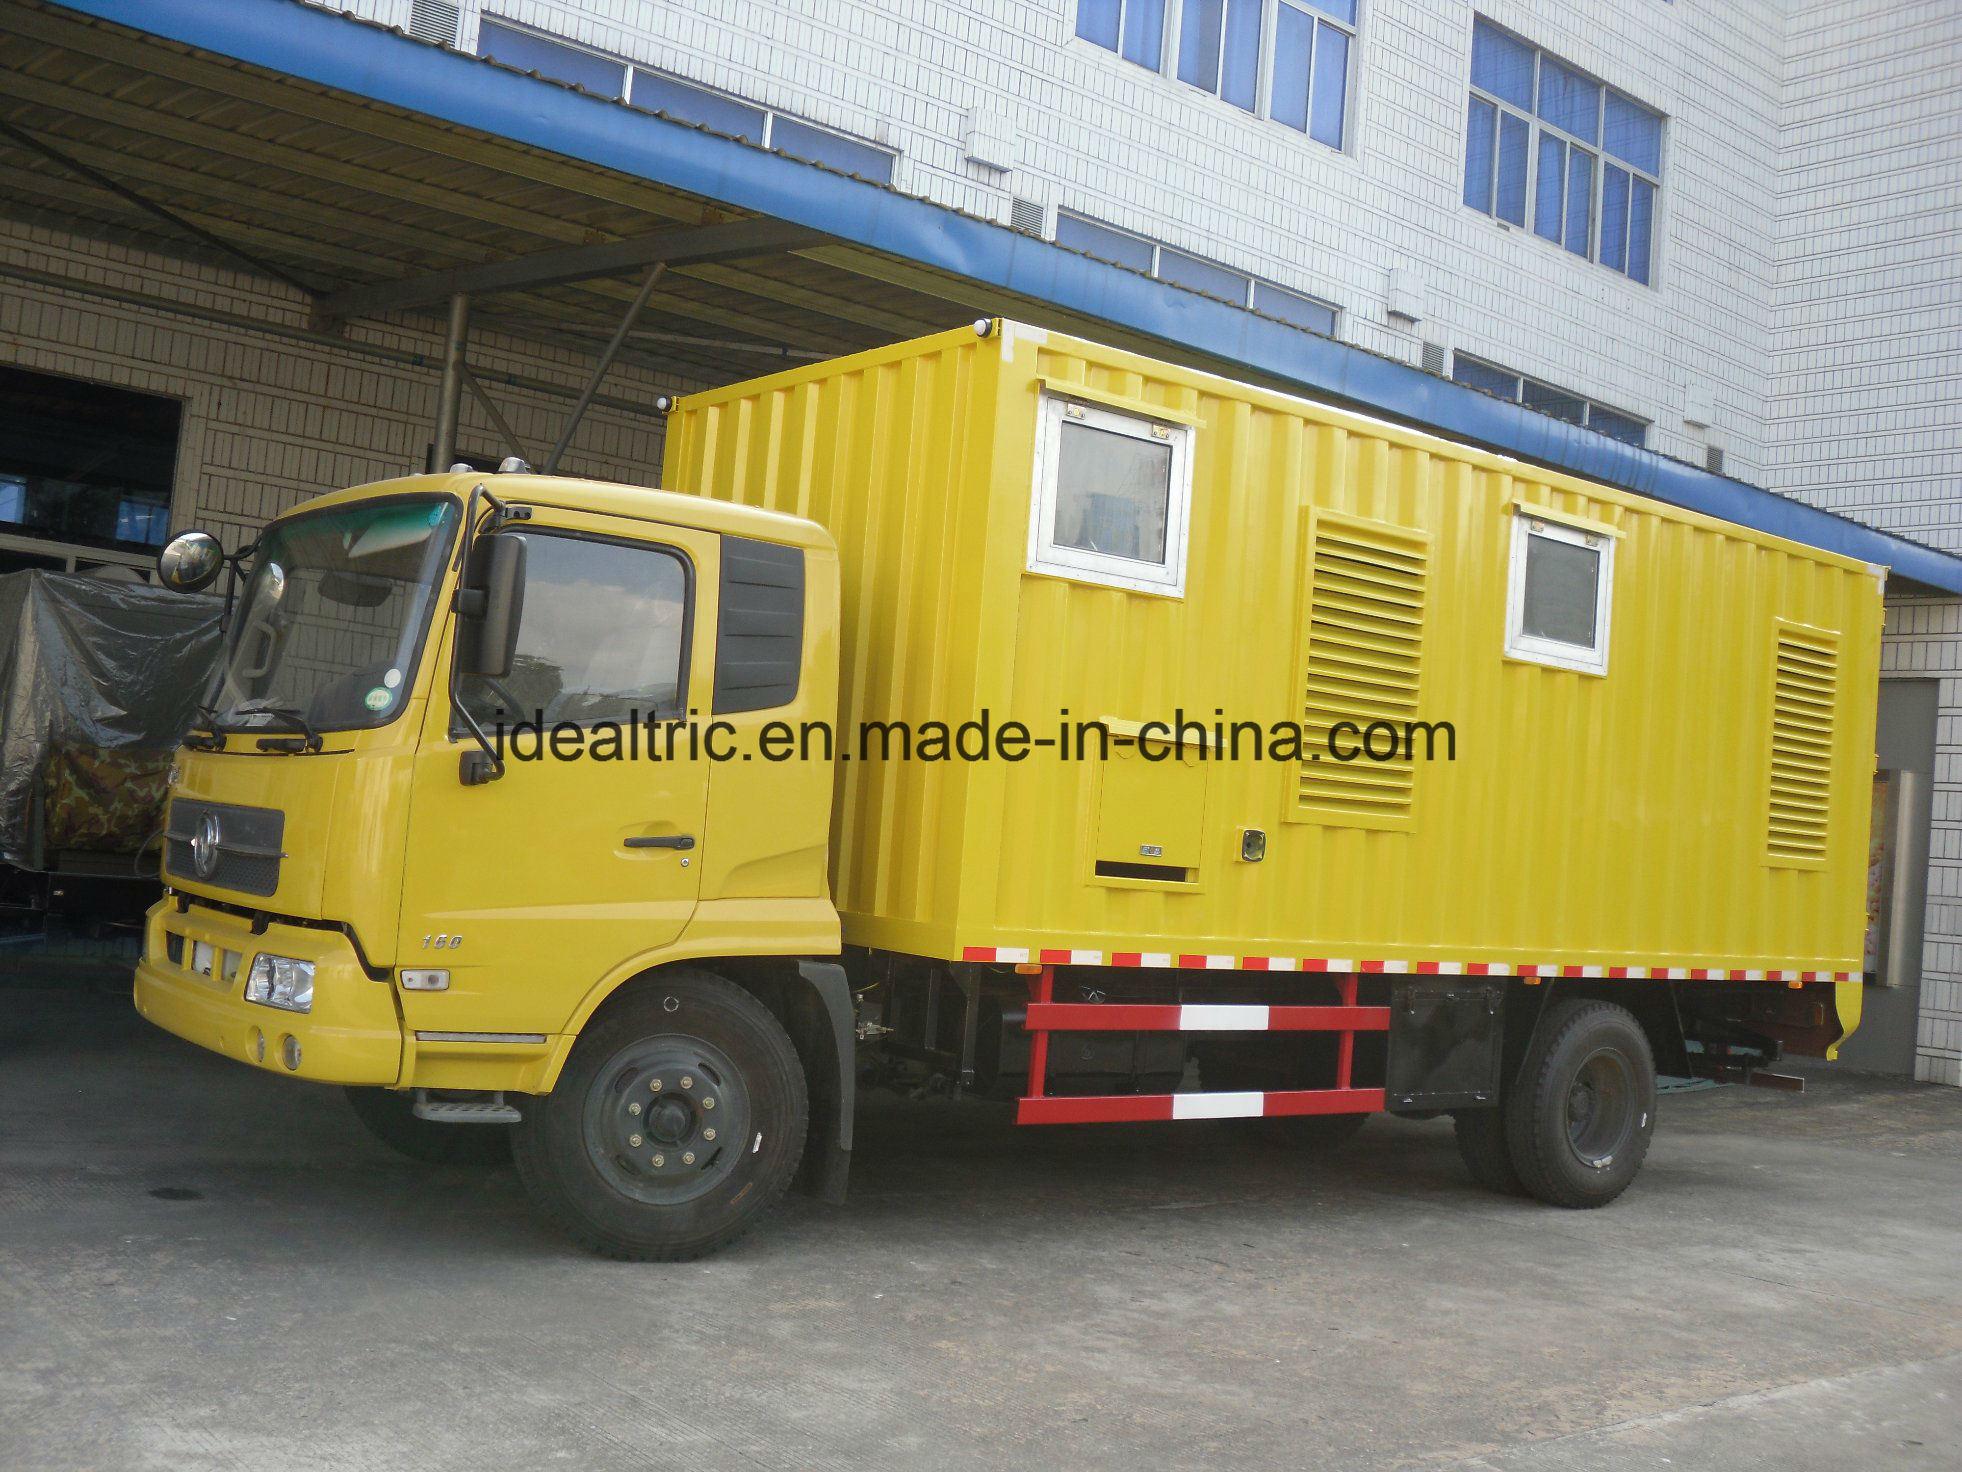 China 200kVA 250kVA 500kVA 400Hz Diesel Generator Power Plant